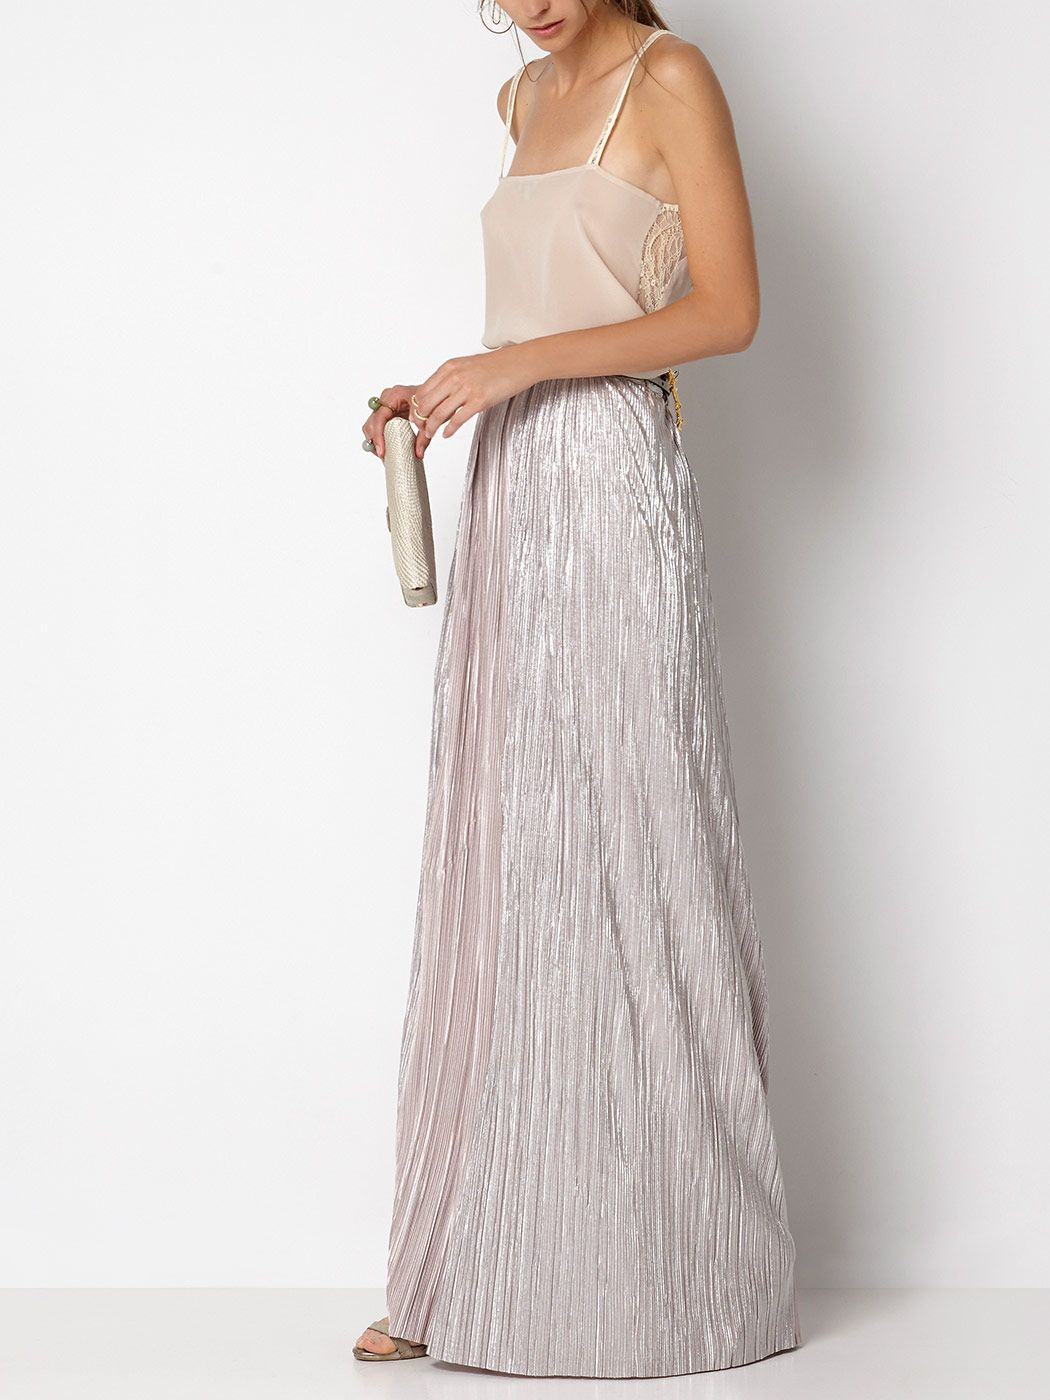 Imagen producto ocassion dress and design fashion pinterest